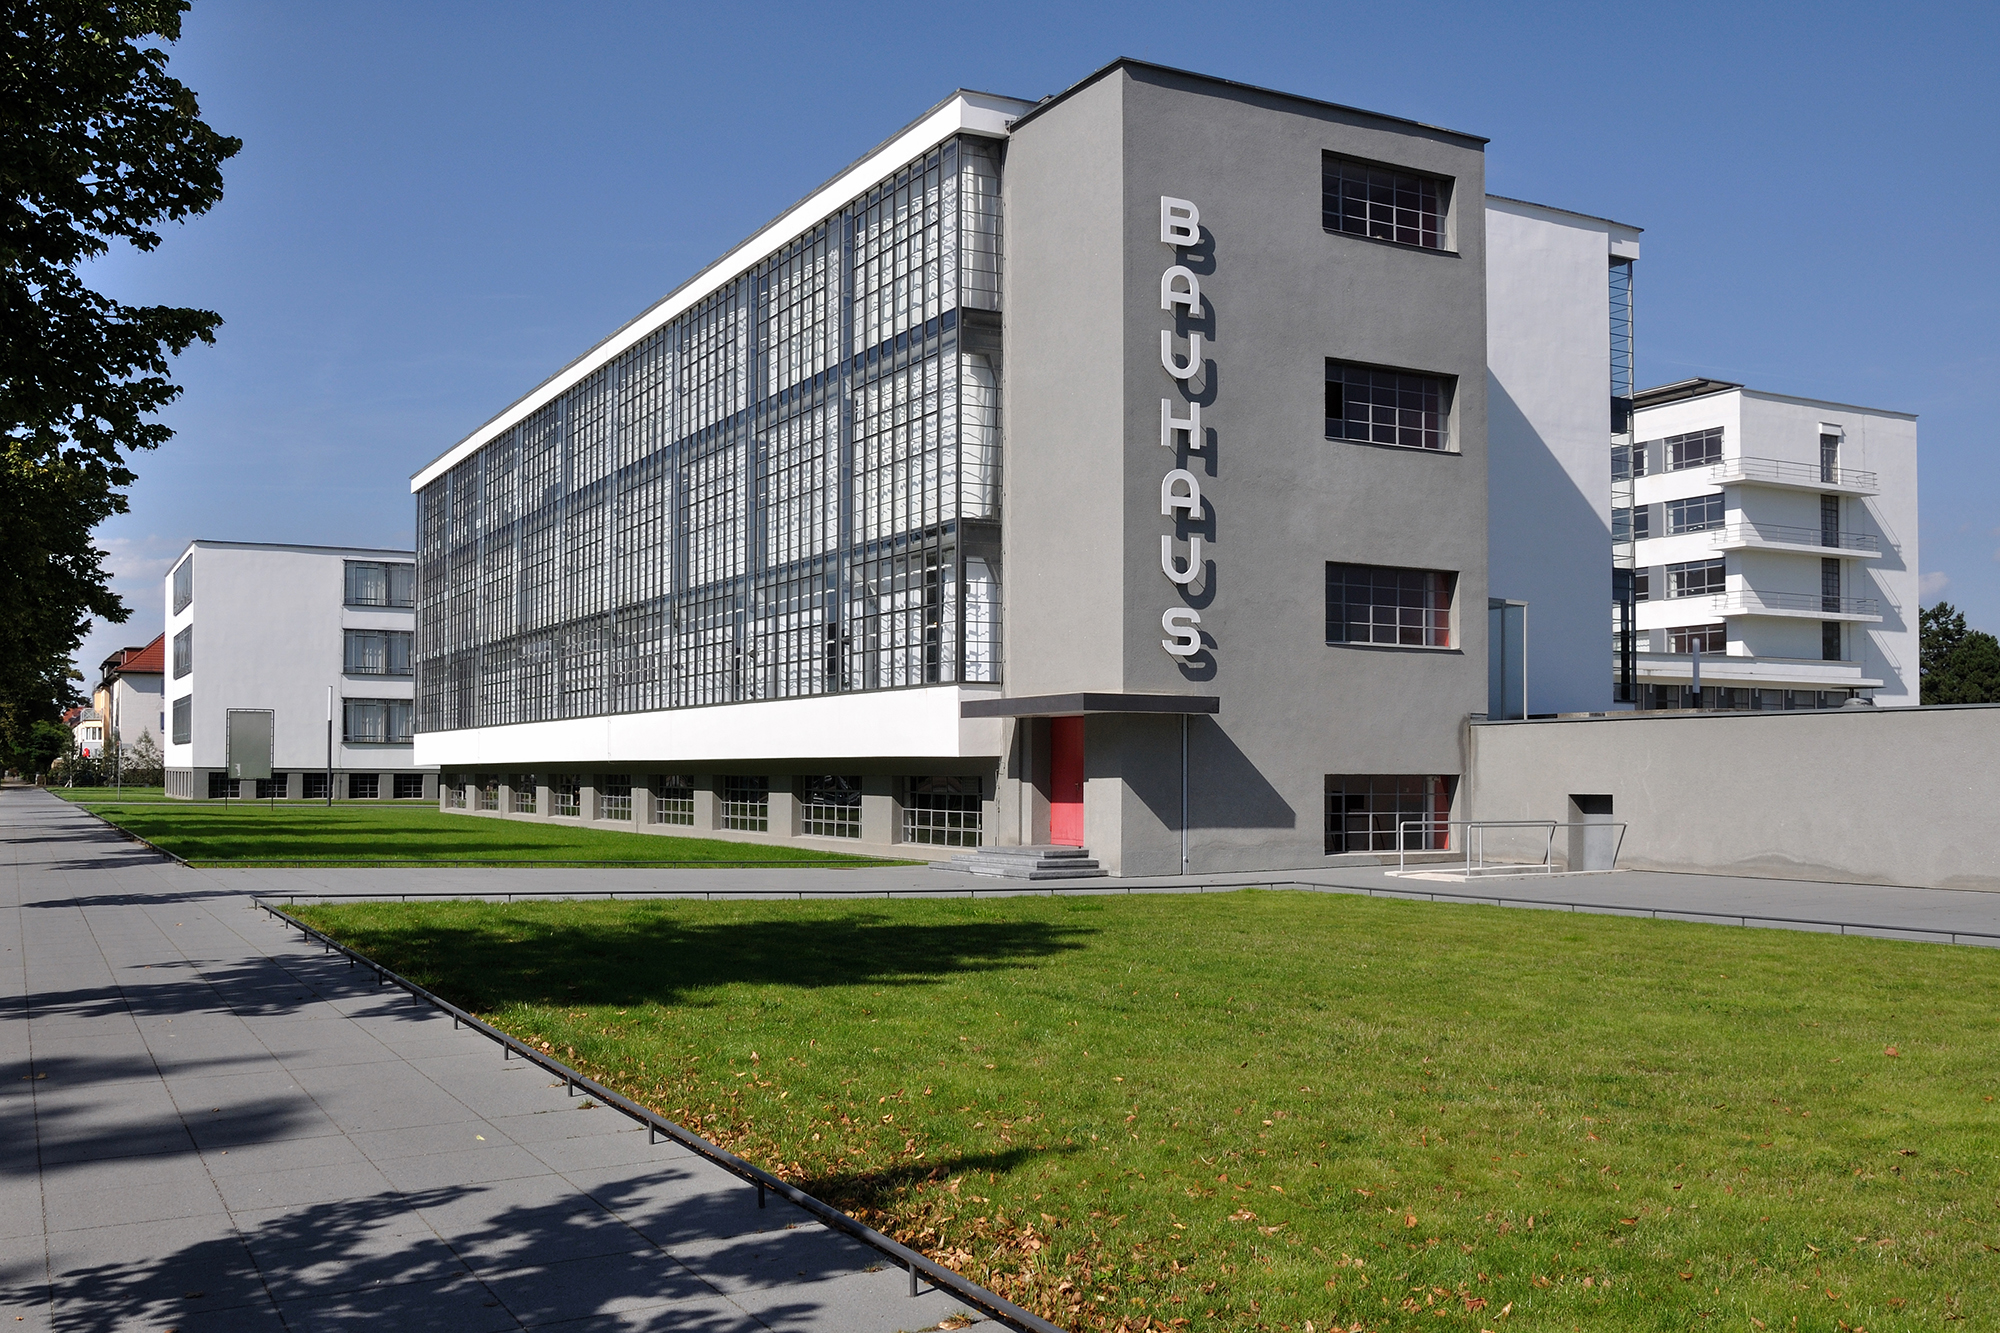 The Bauhaus According To Google